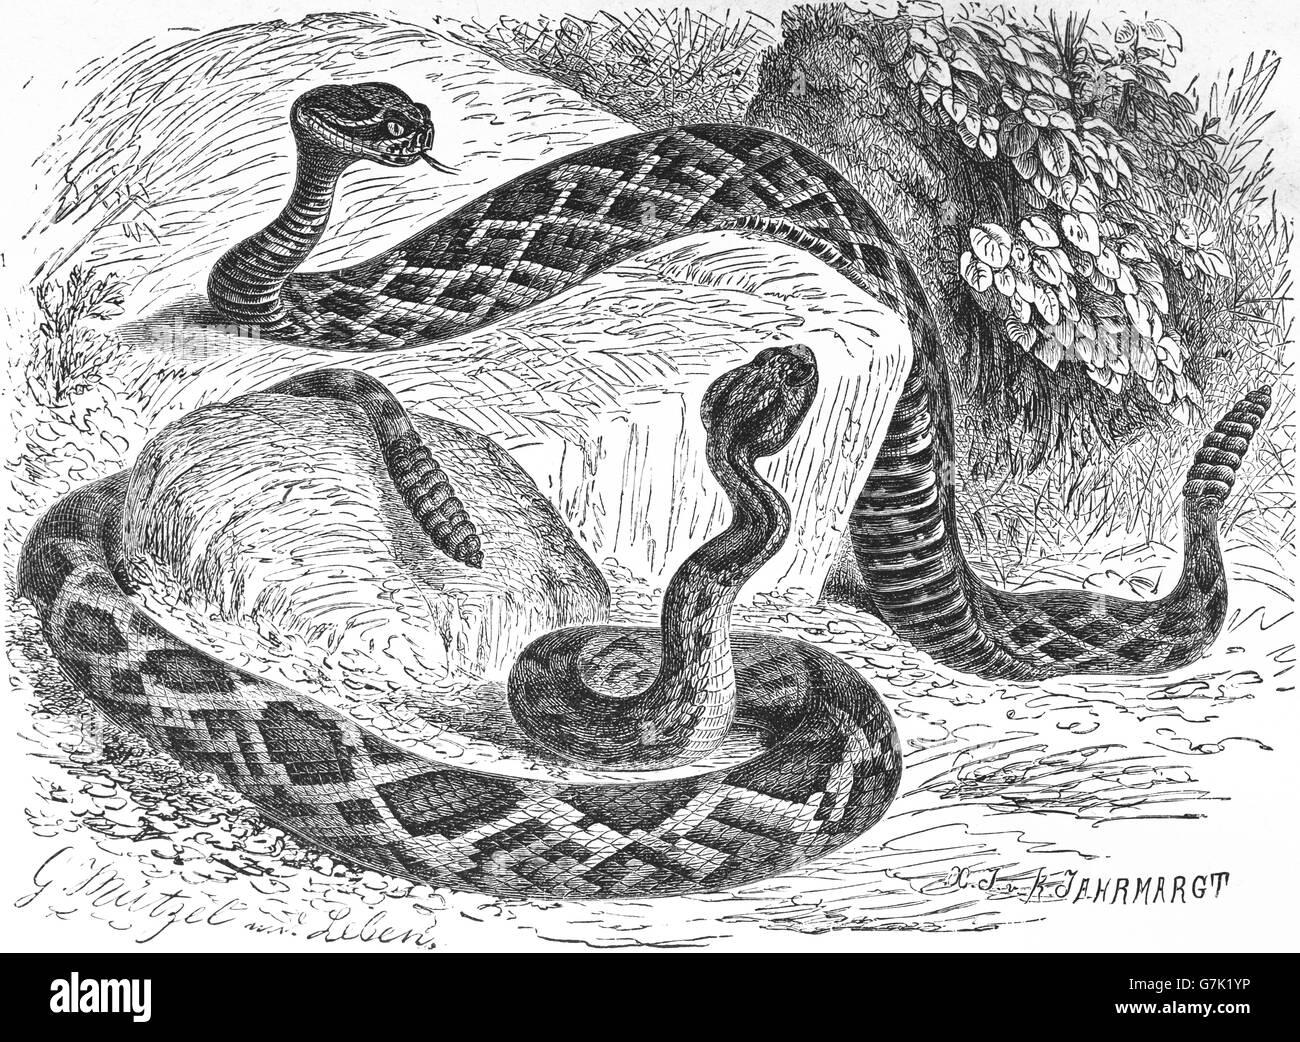 Eastern diamondback rattlesnake, Crotalus adamanteus and Timber rattlesnake, Crotalus horridus, illustration from Stock Photo